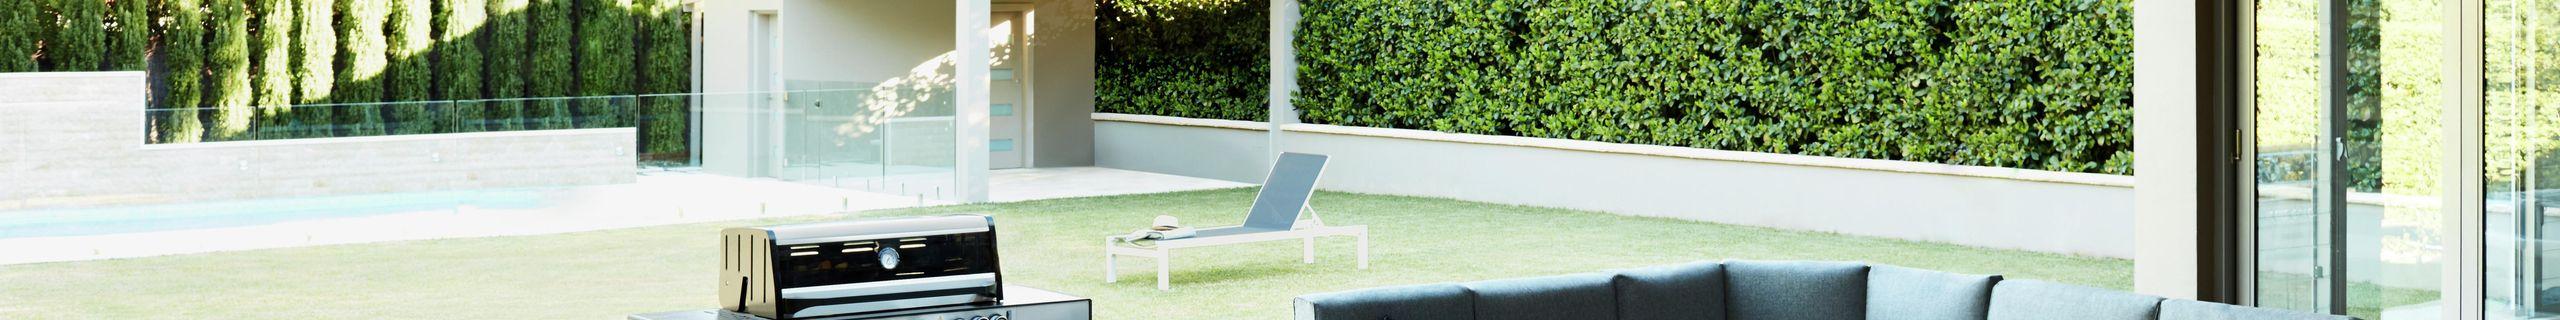 Outdoor furniture - Decking - BBQ - Backyard - Wide